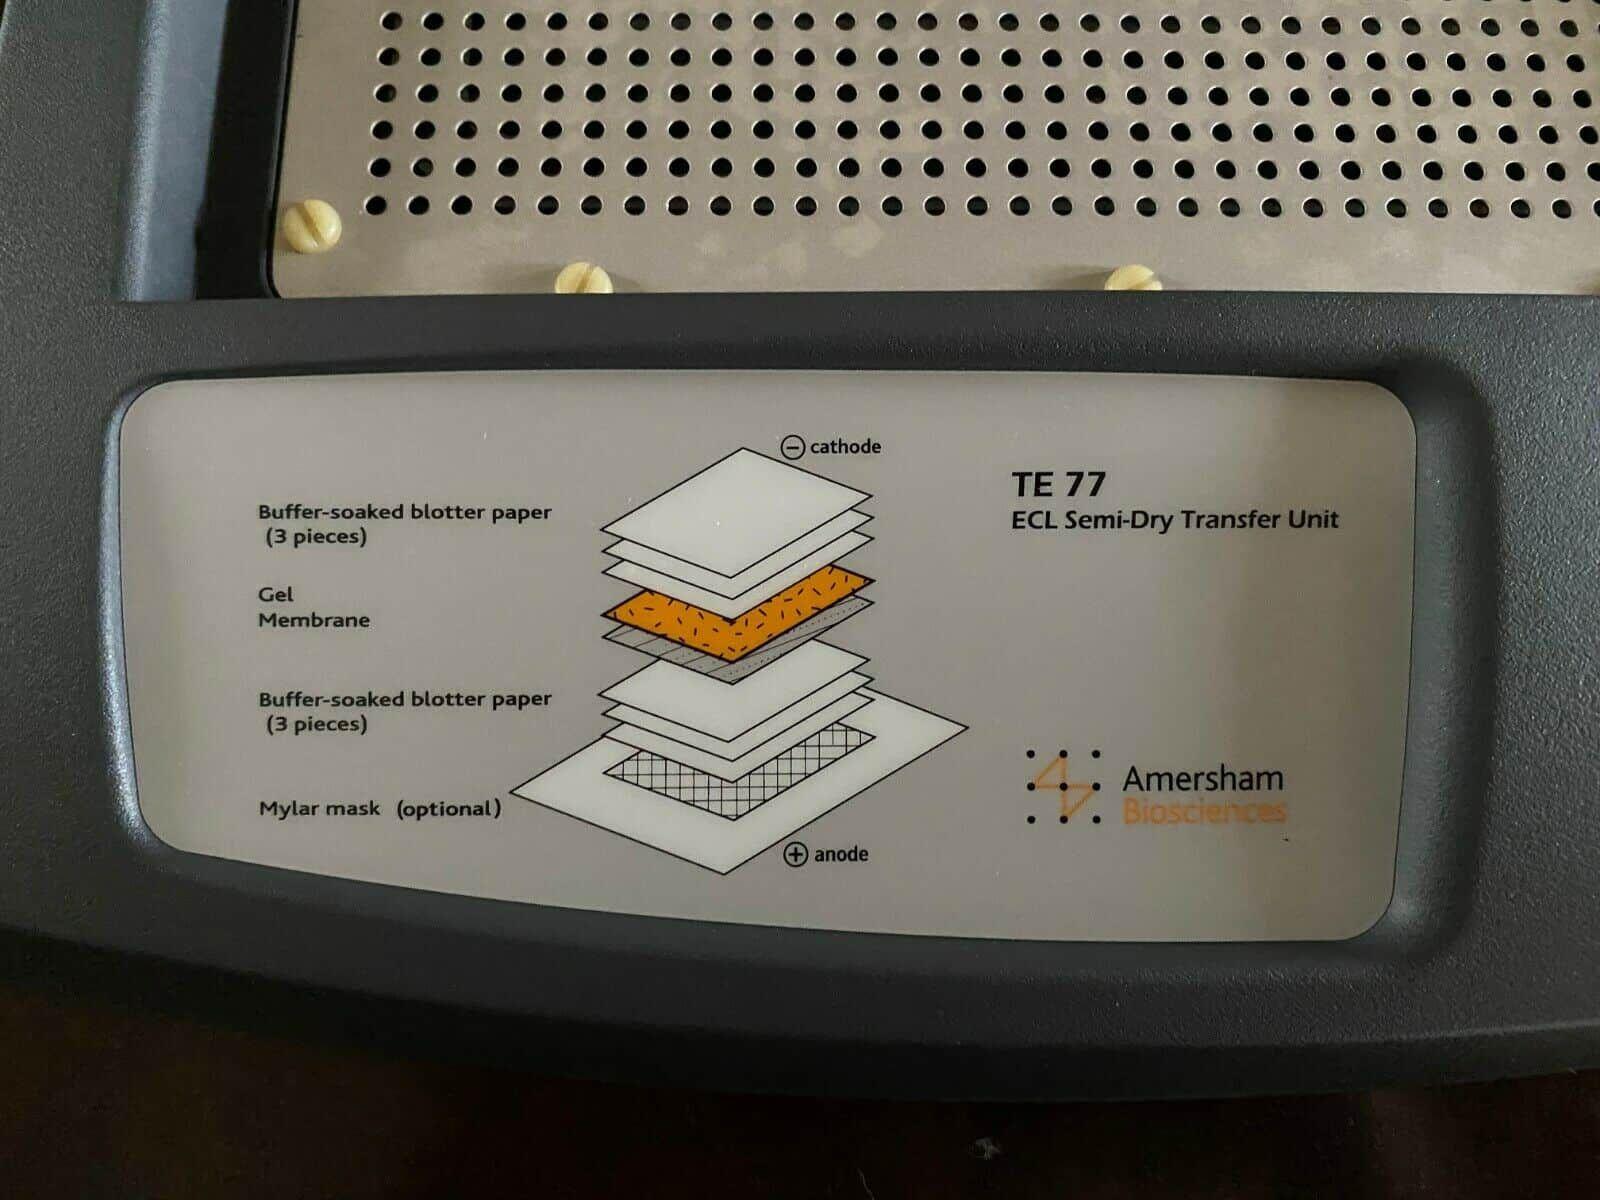 GE Healthcare Amersham Biosciences TE77 Semi-Dry Transfer Unit for Western Blot